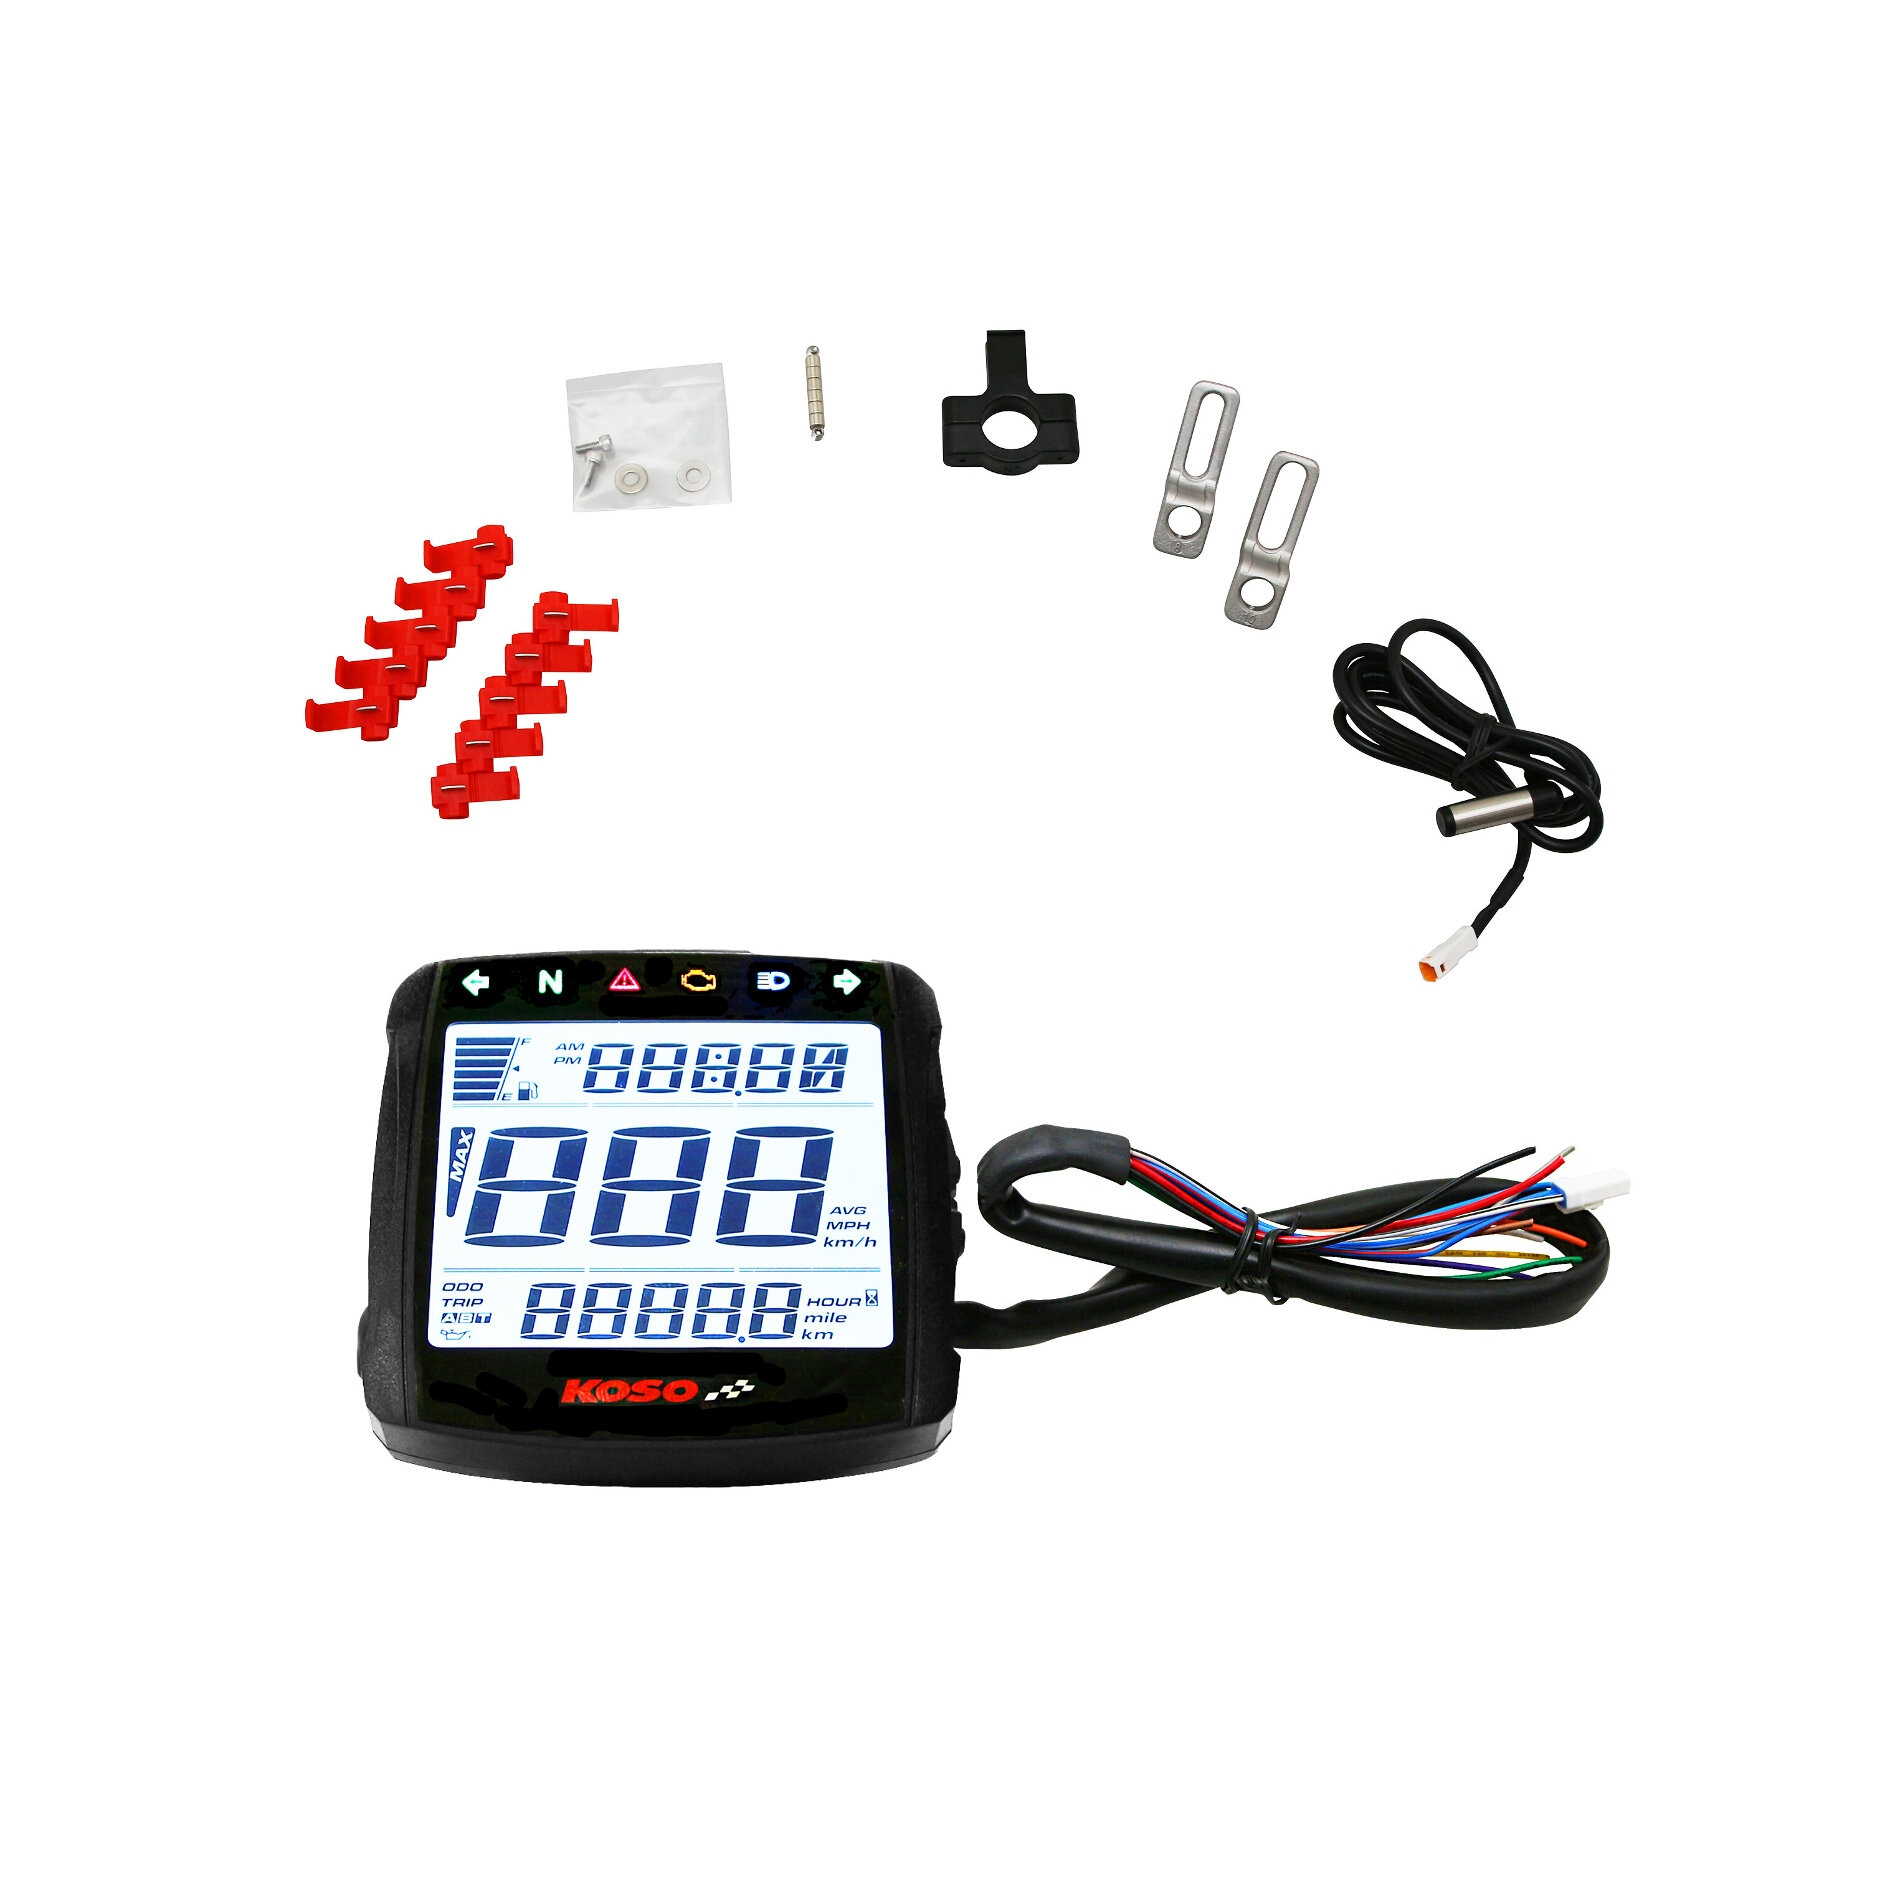 Compteur digital Koso multifonctions XR-01S